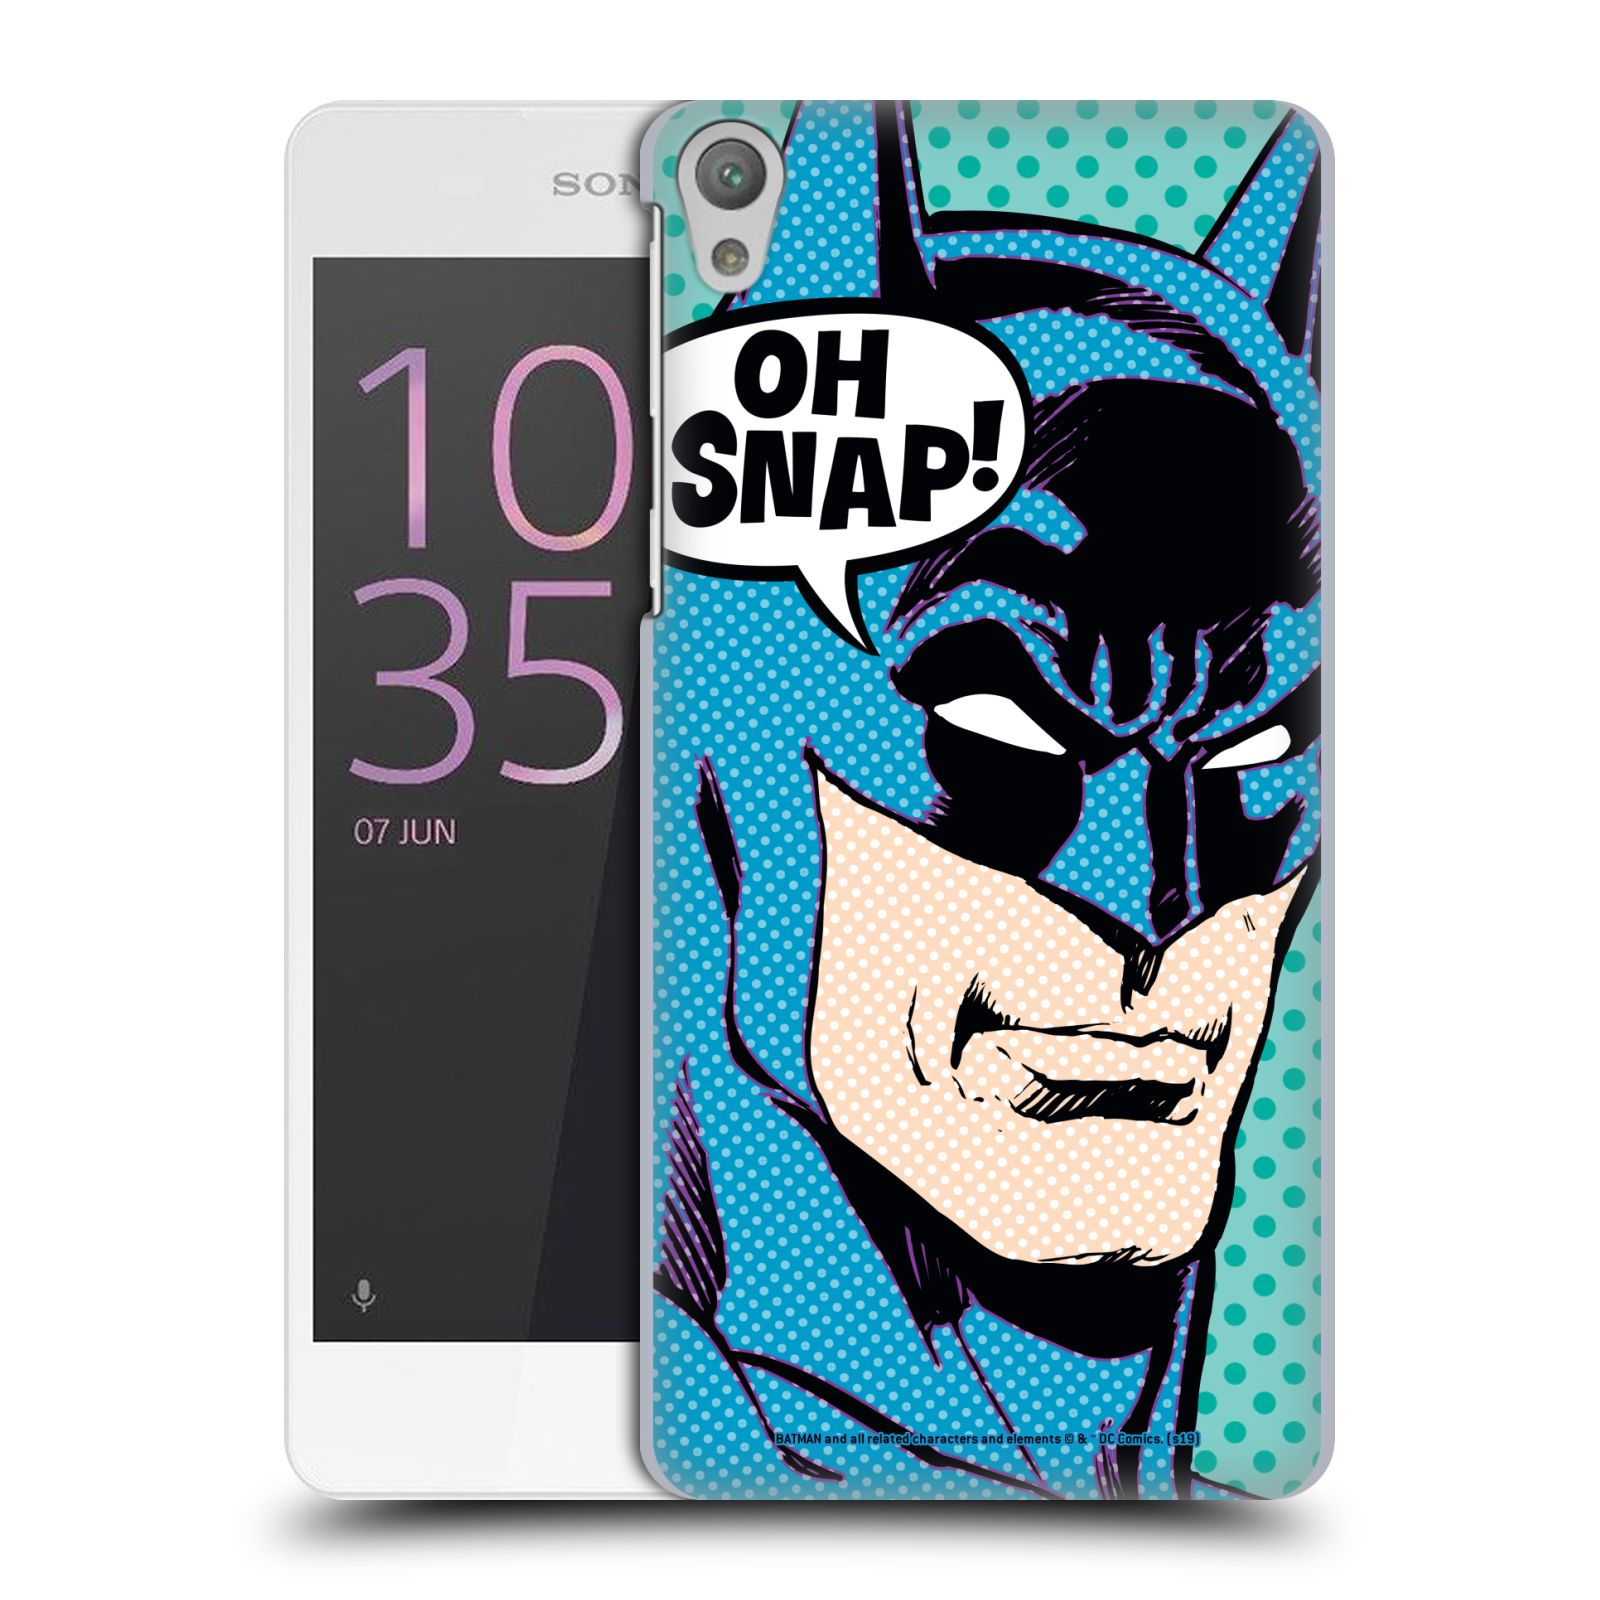 Pouzdro na mobil Sony Xperia E5 - HEAD CASE - DC komix Batman Pop Art tvář